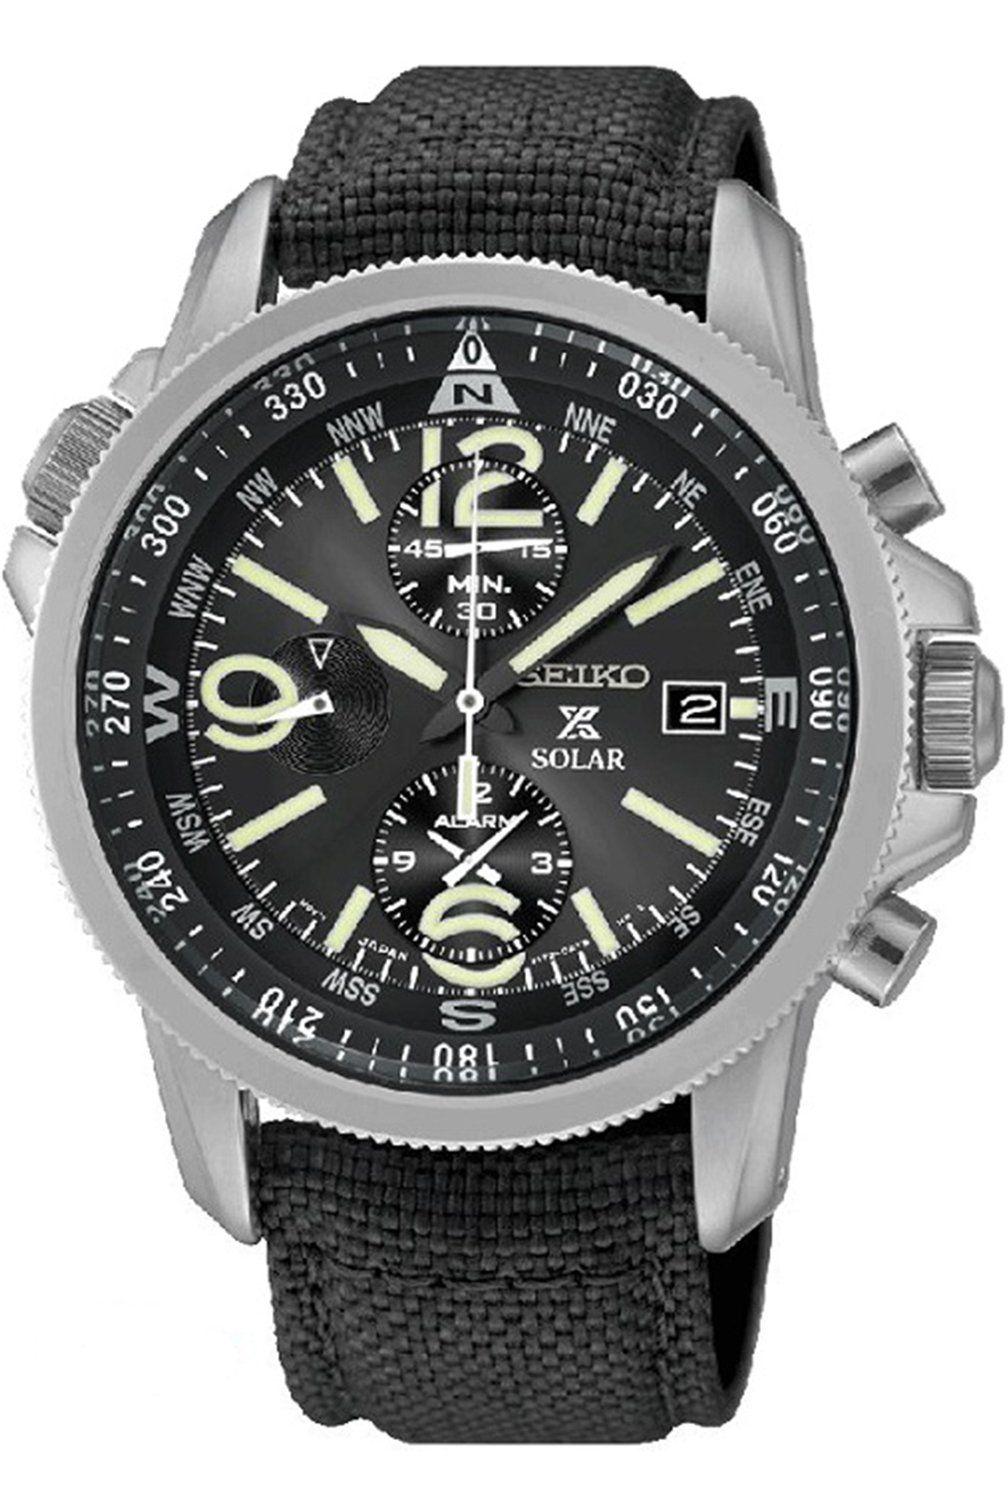 926464eb2433c Seiko SSC293P2 Prospex Men s Solar Military Alarm Chronograph 100m Water  Resistant